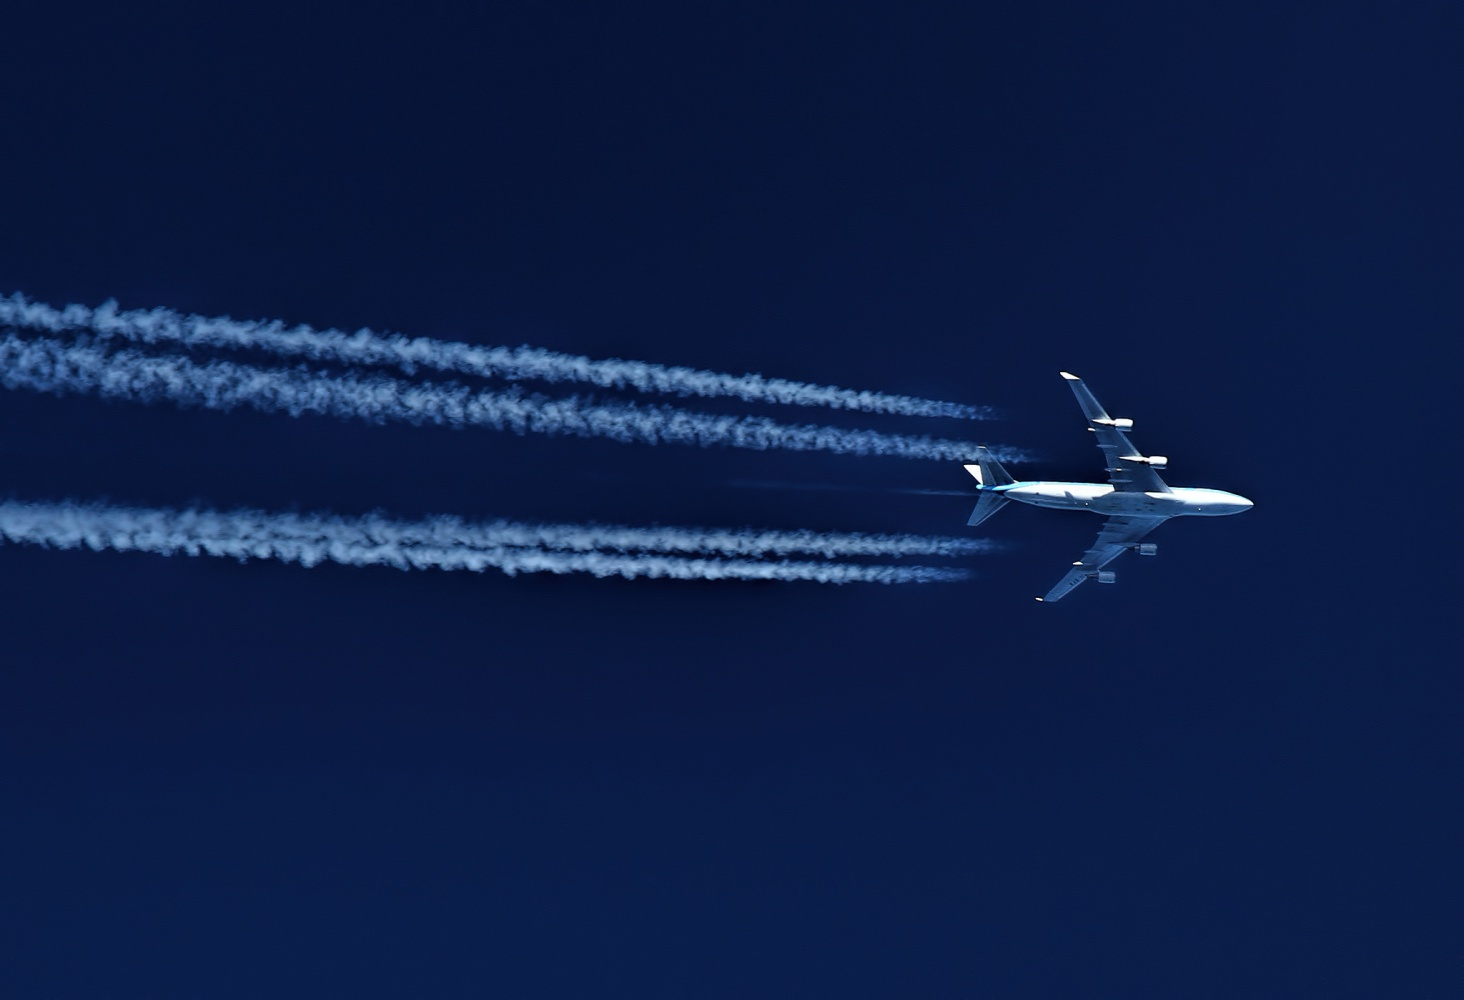 boeing-747-passazhirskiy